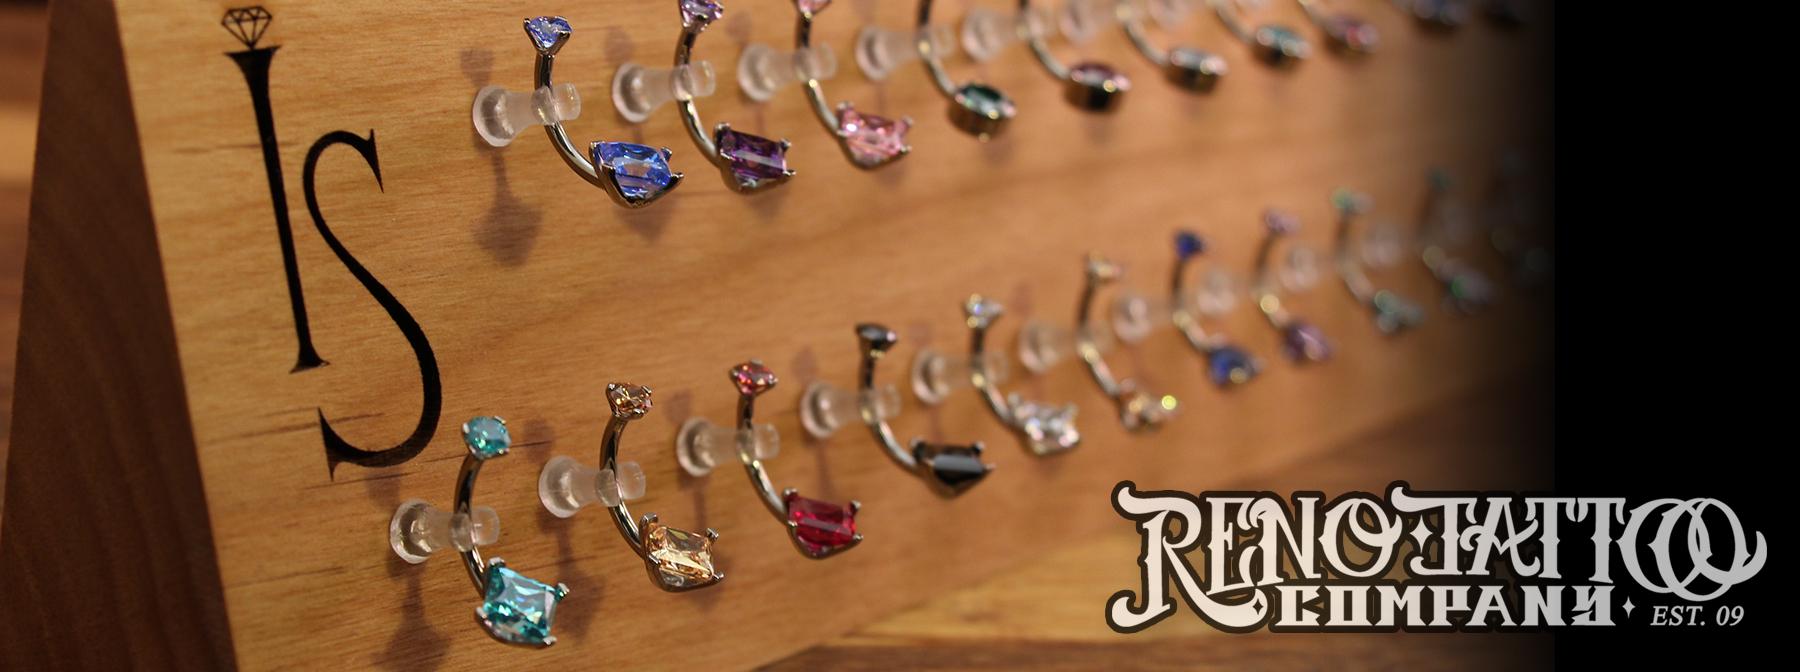 Reno Tattoo Company jewelry